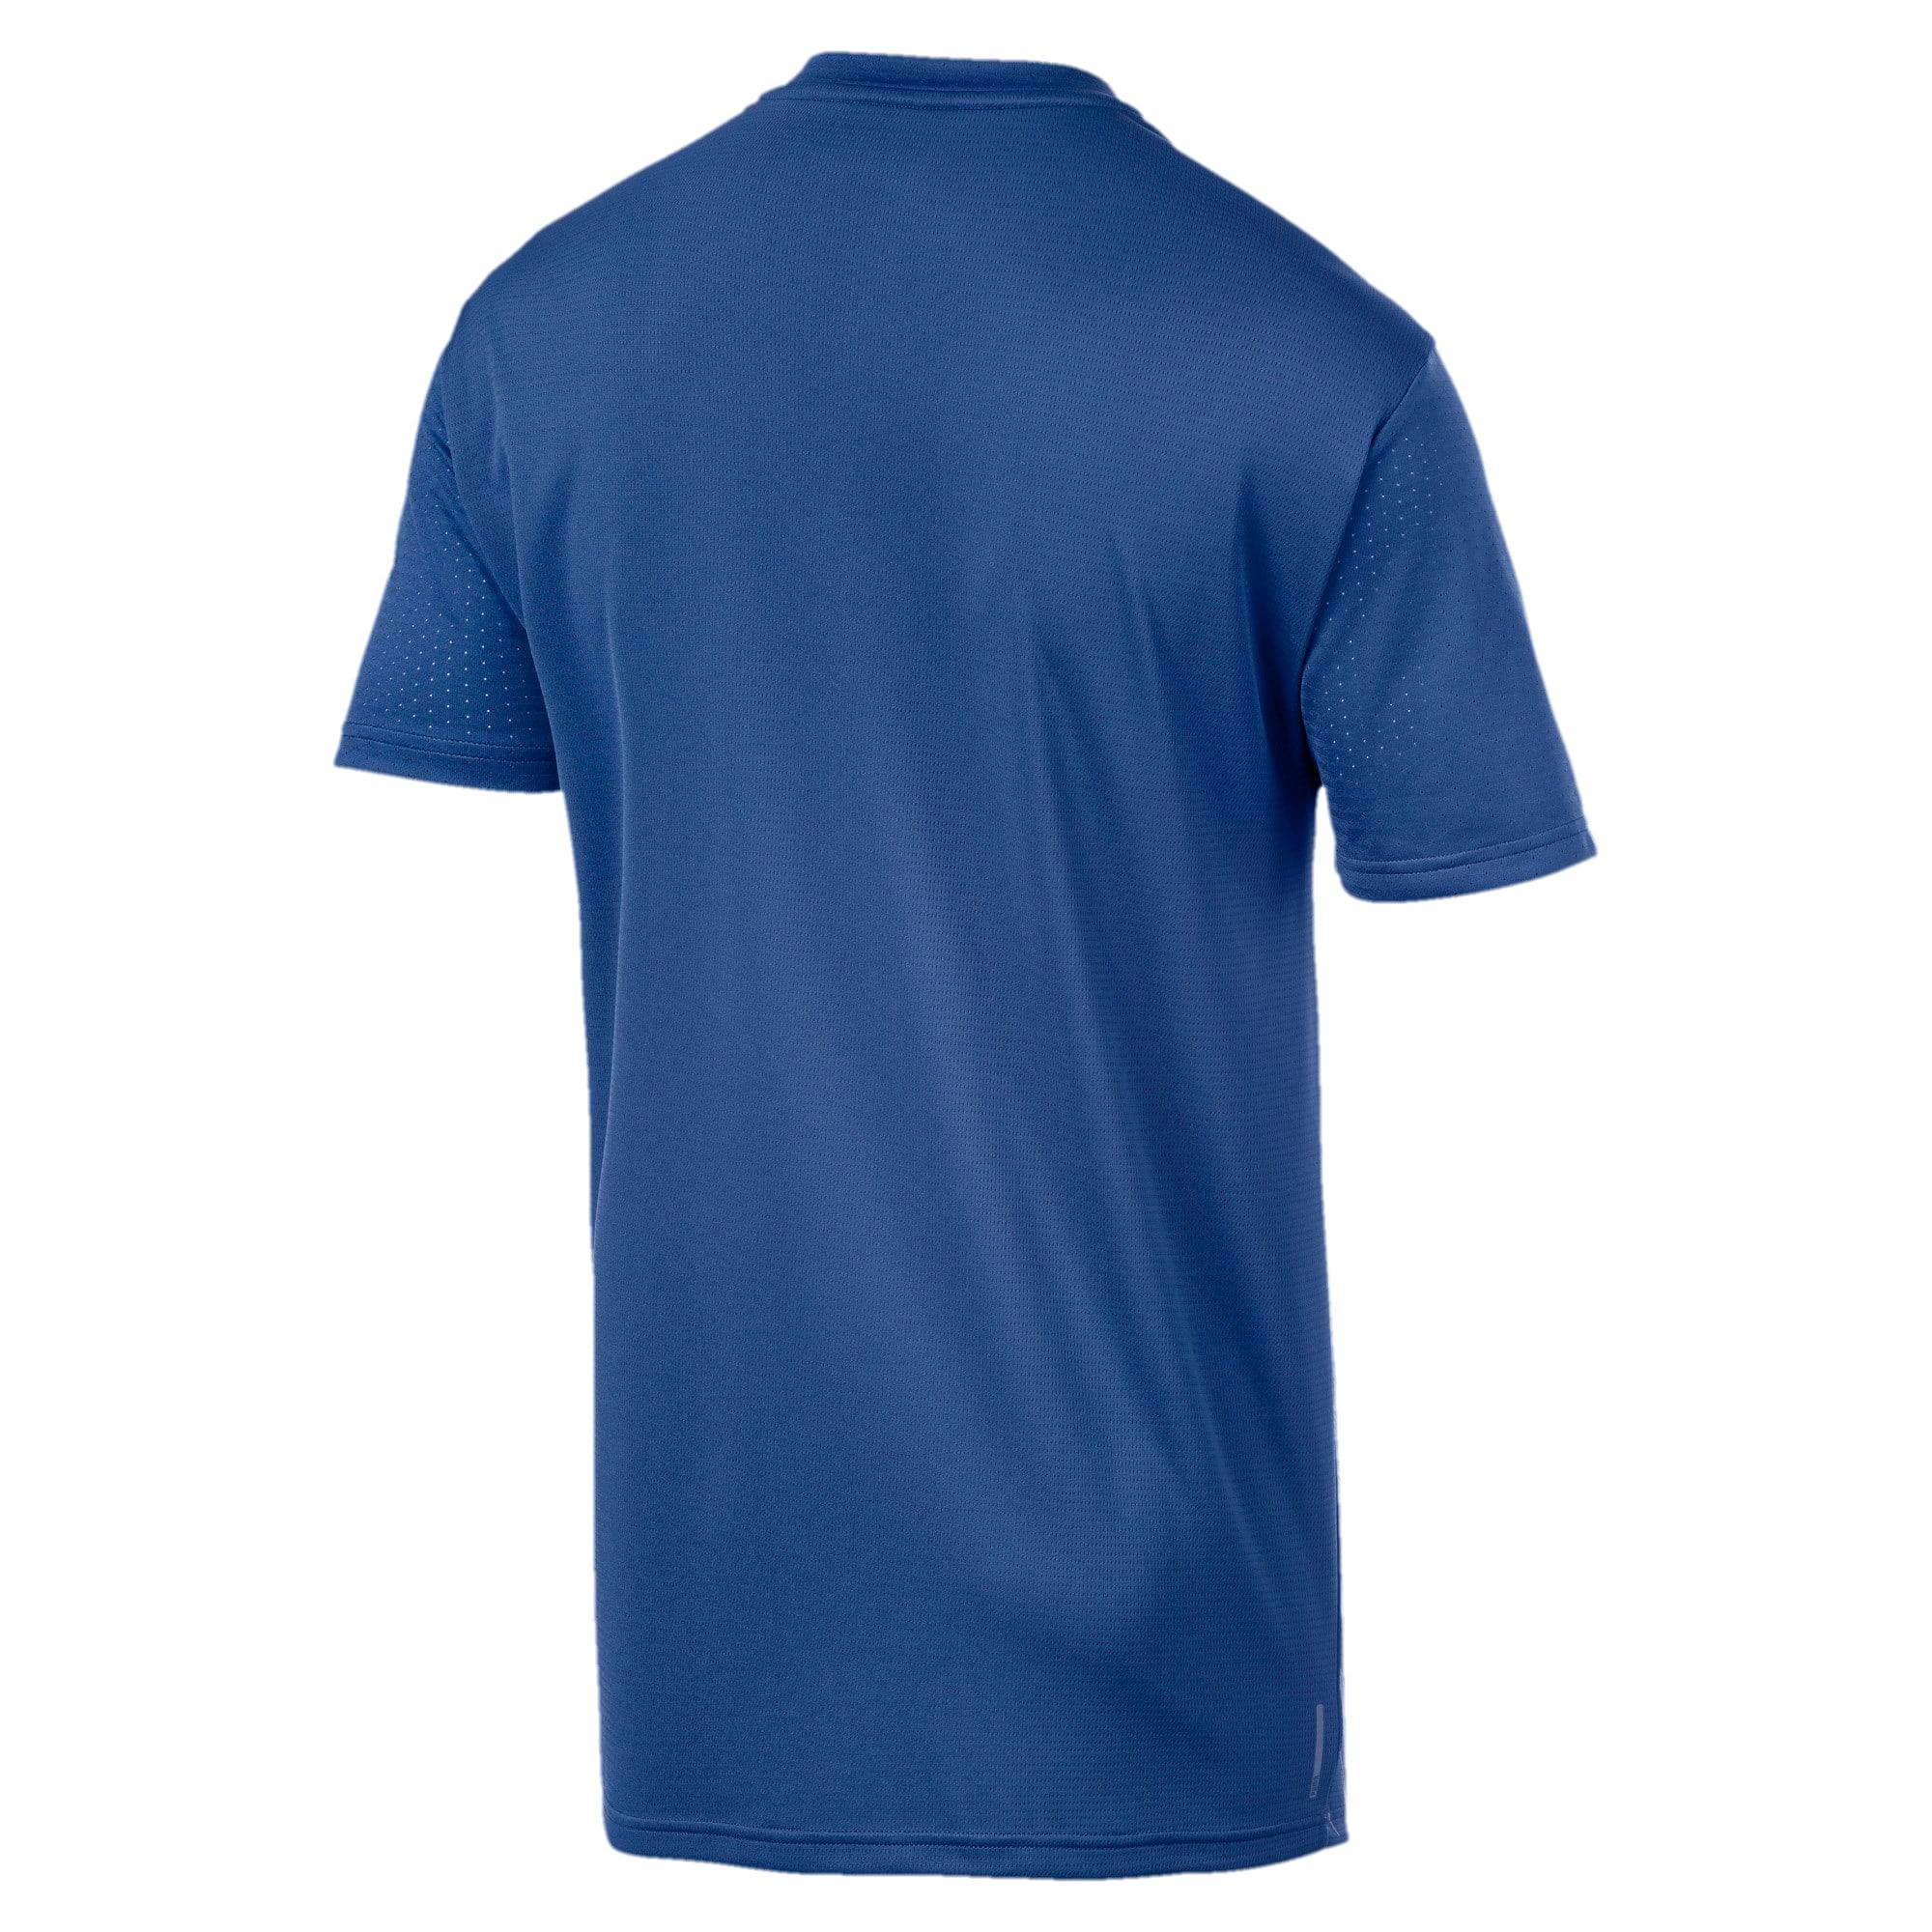 Thumbnail 5 of Collective Herren T-Shirt, Galaxy Blue, medium